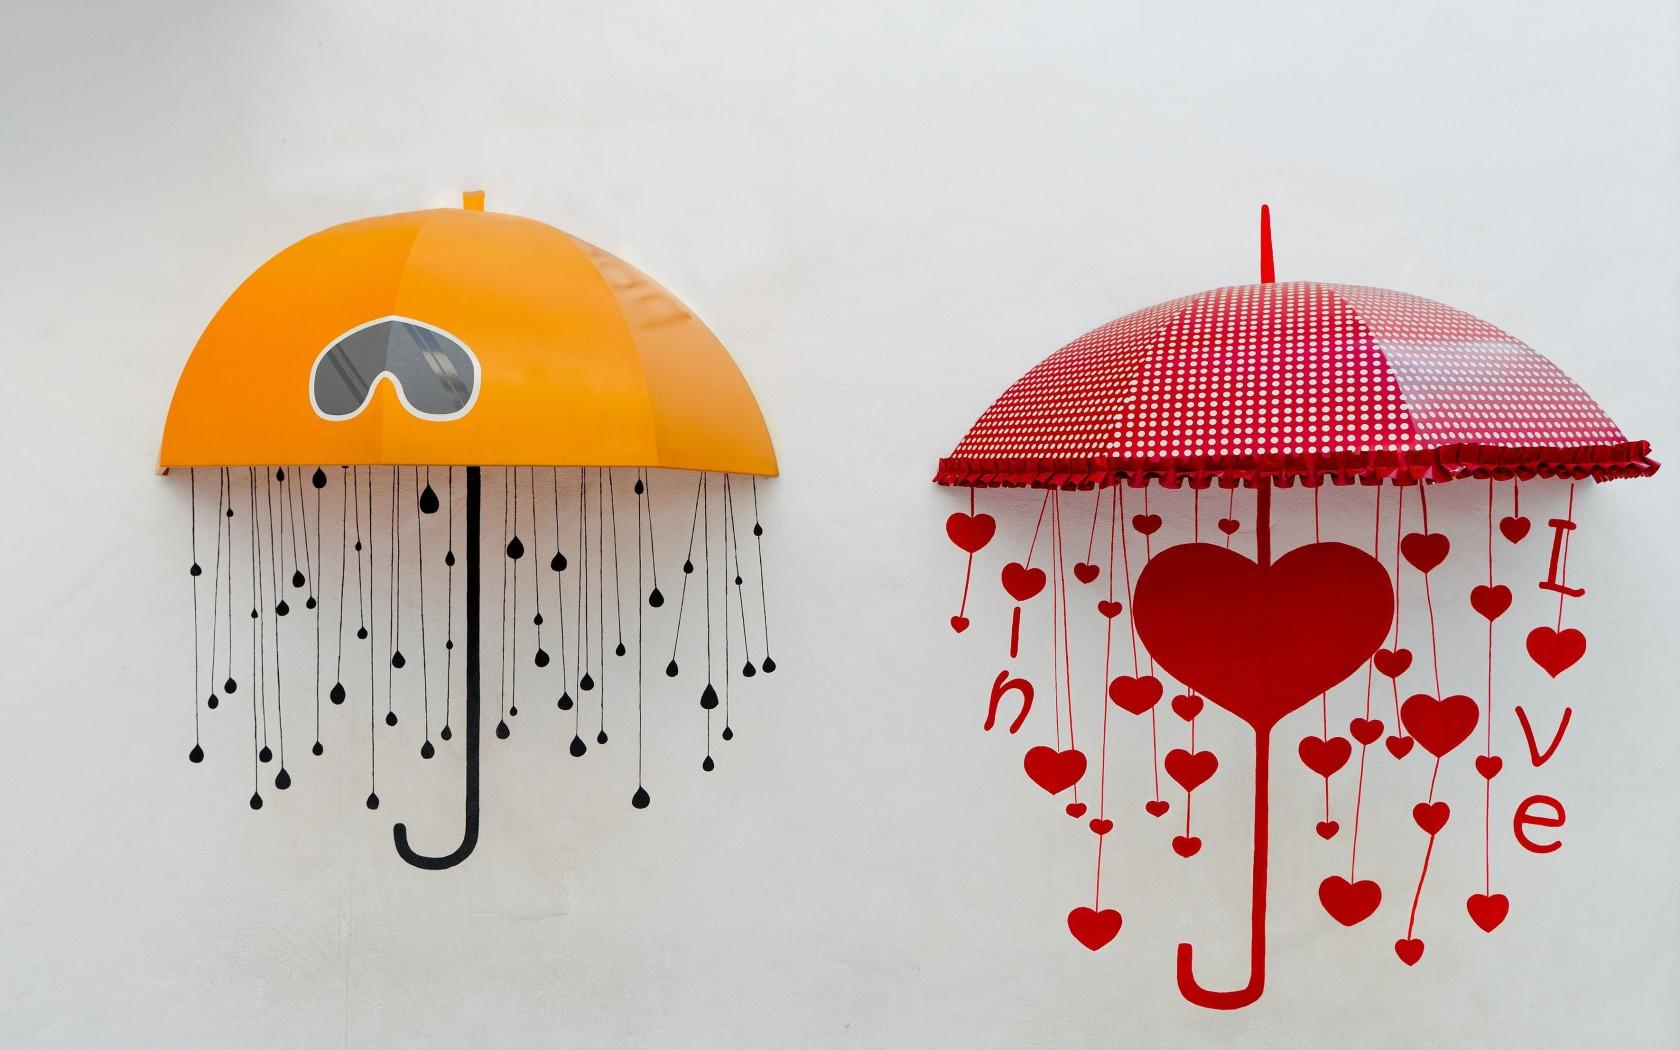 umbrellas umbrella heart heart yellow red background wallpaper 1680x1050